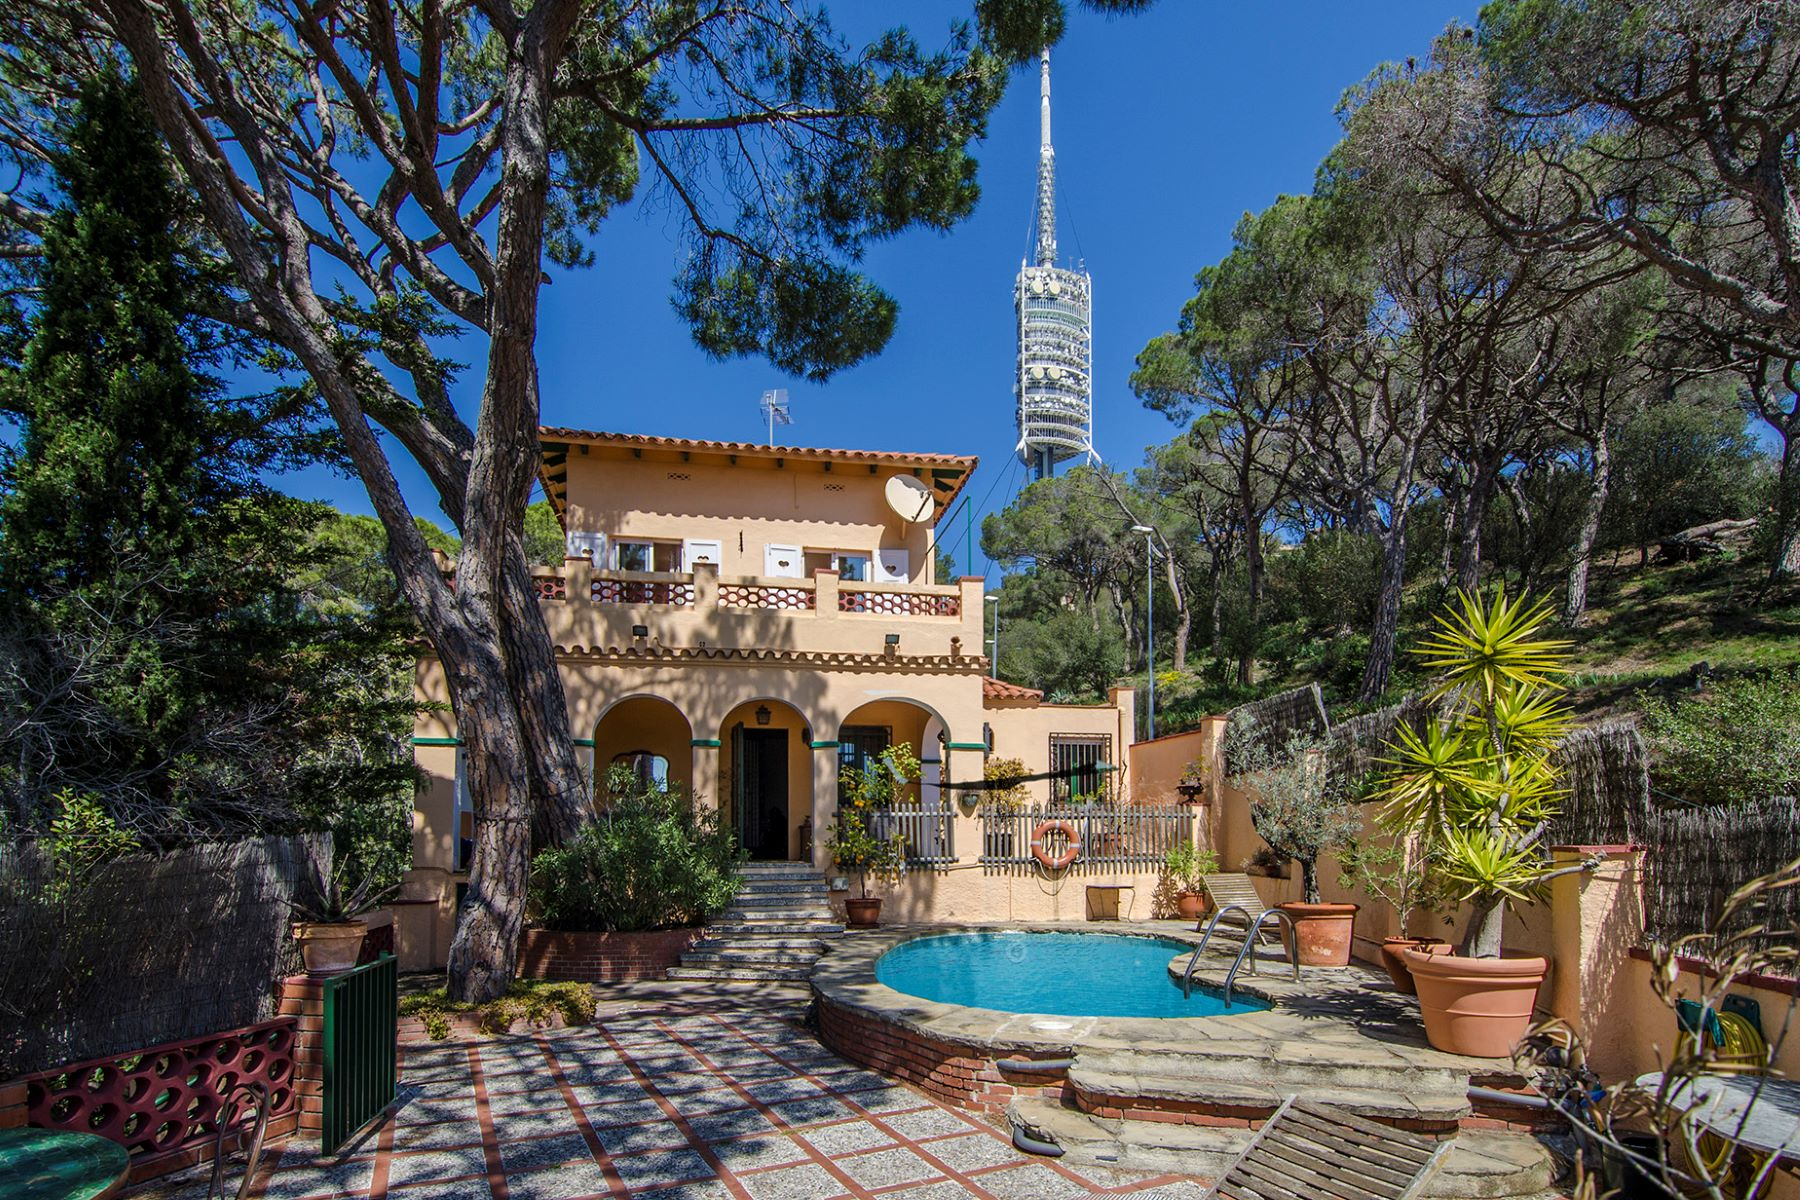 Moradia para Venda às Rustic House with Views in Uptown Barcelona Barcelona City, Barcelona, 08034 Espanha